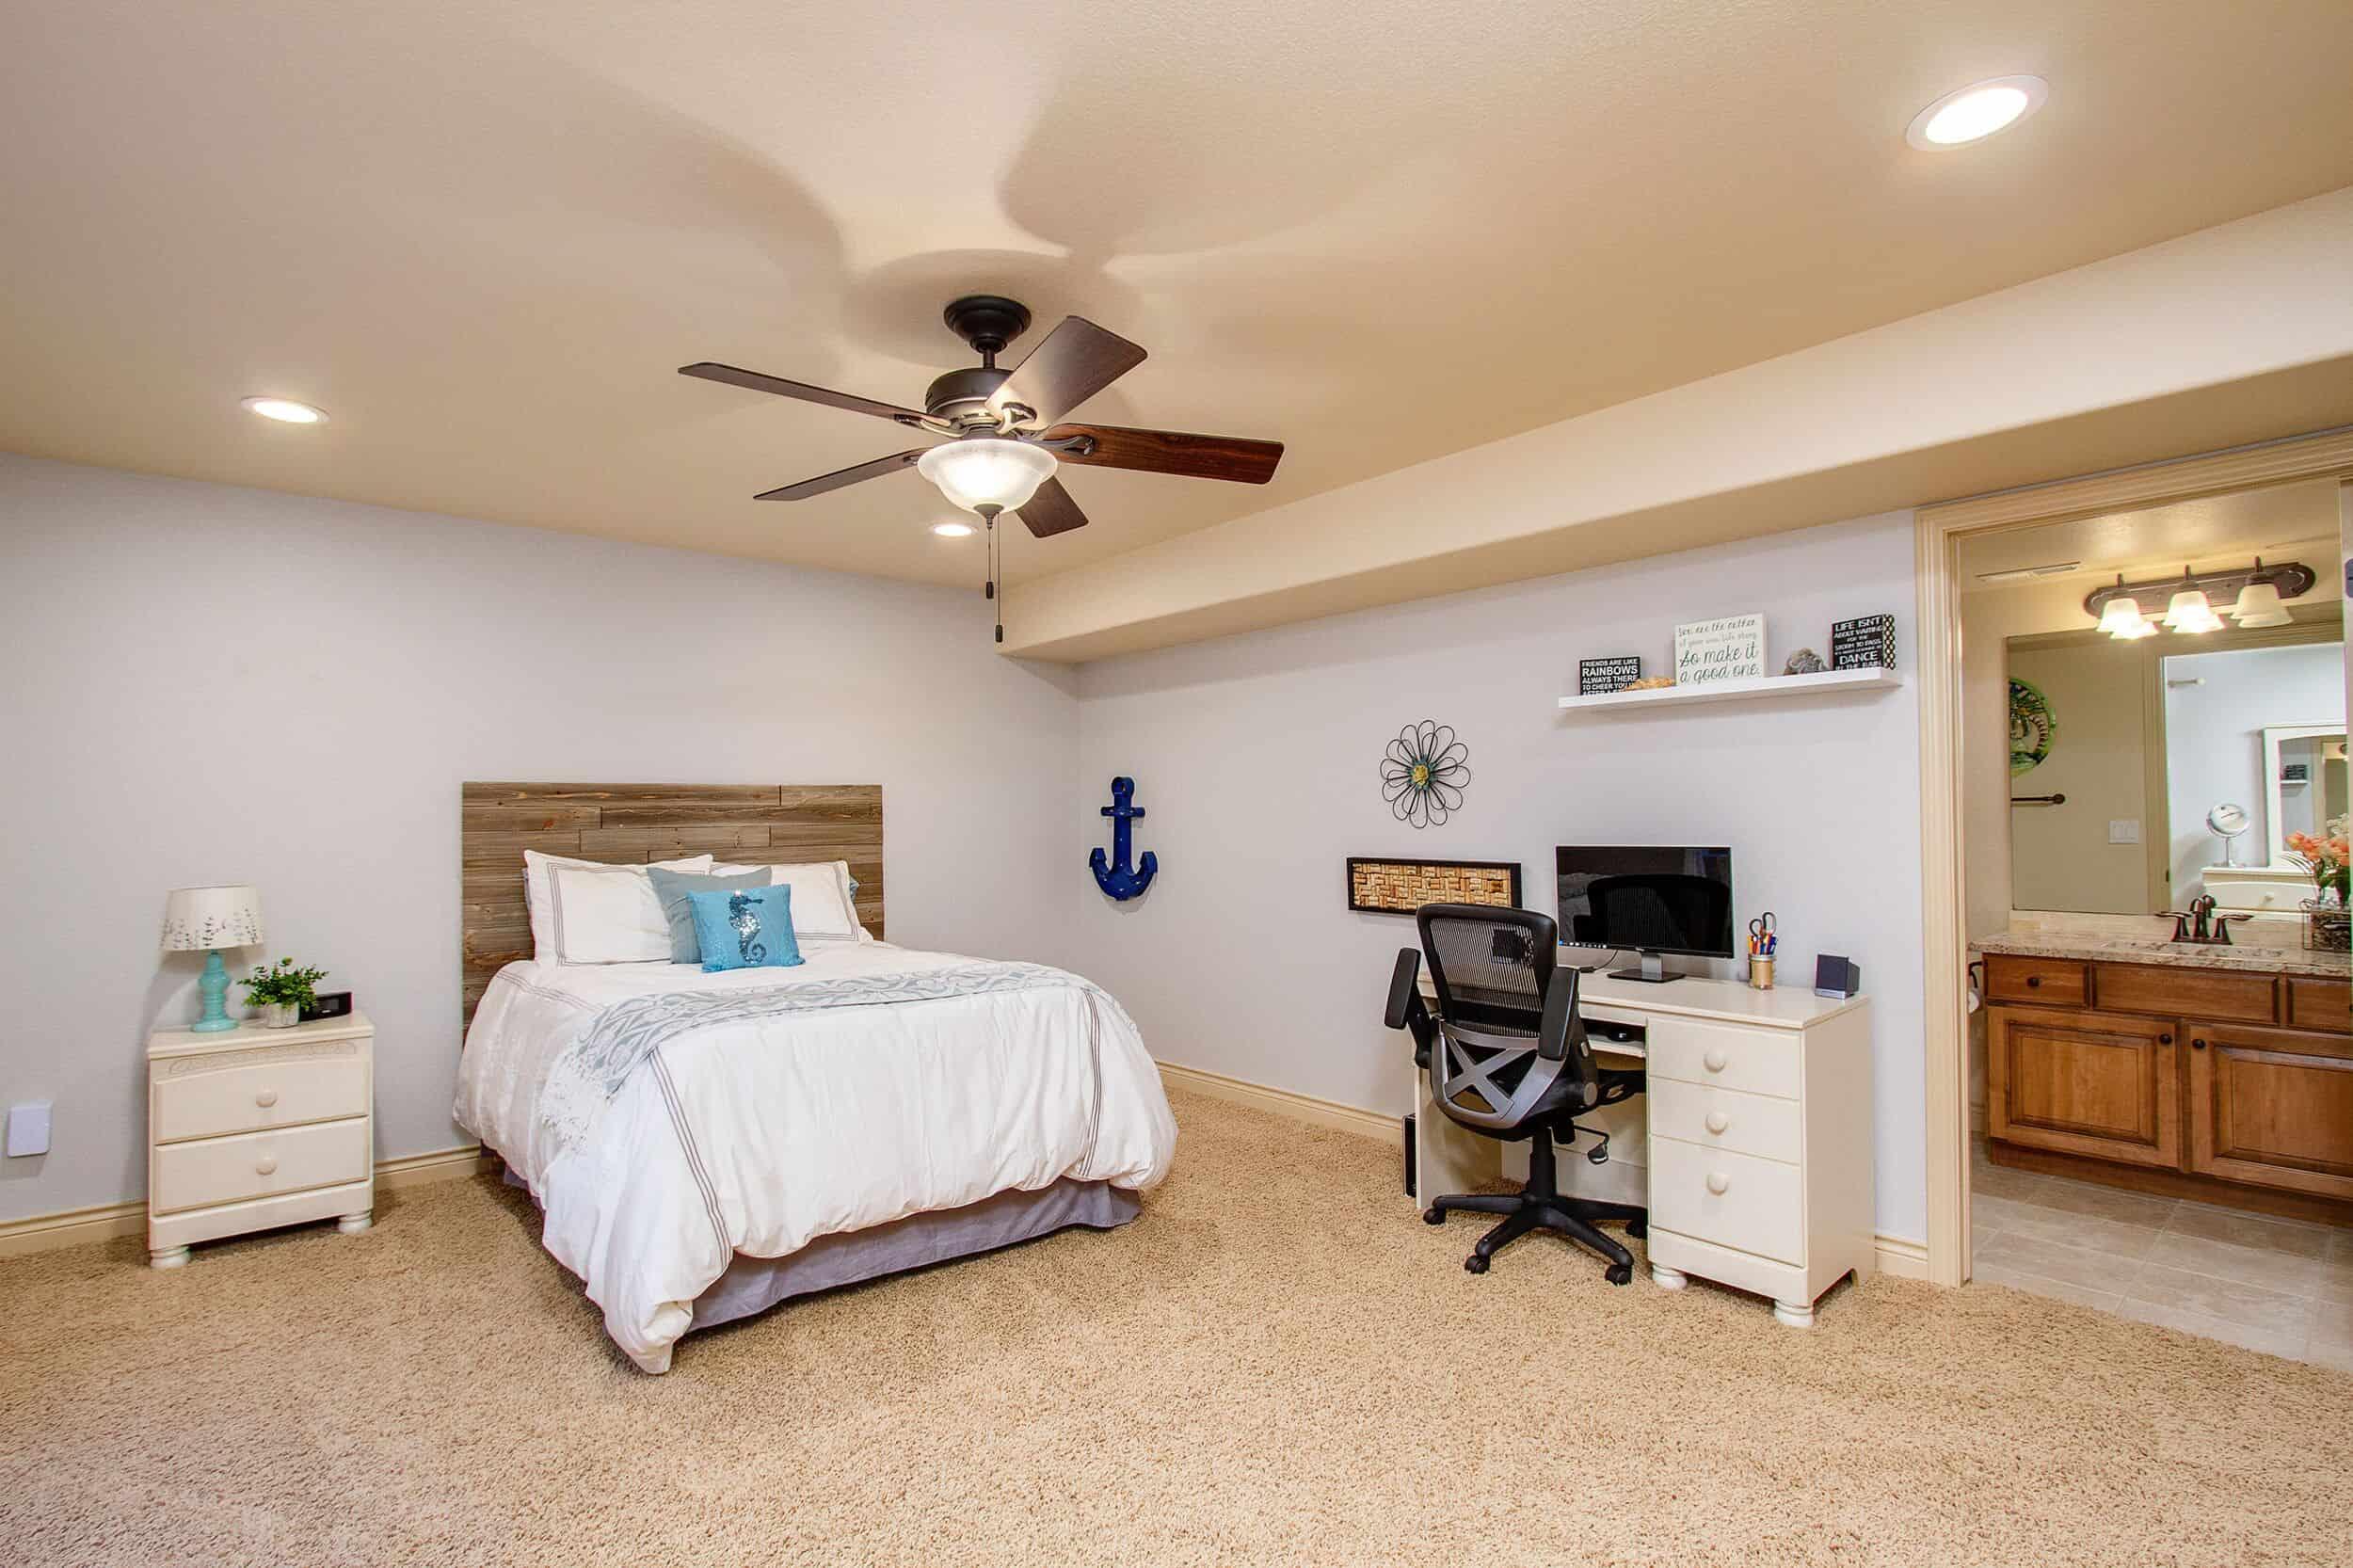 Basement Bedroom with Ensuite Bathroom